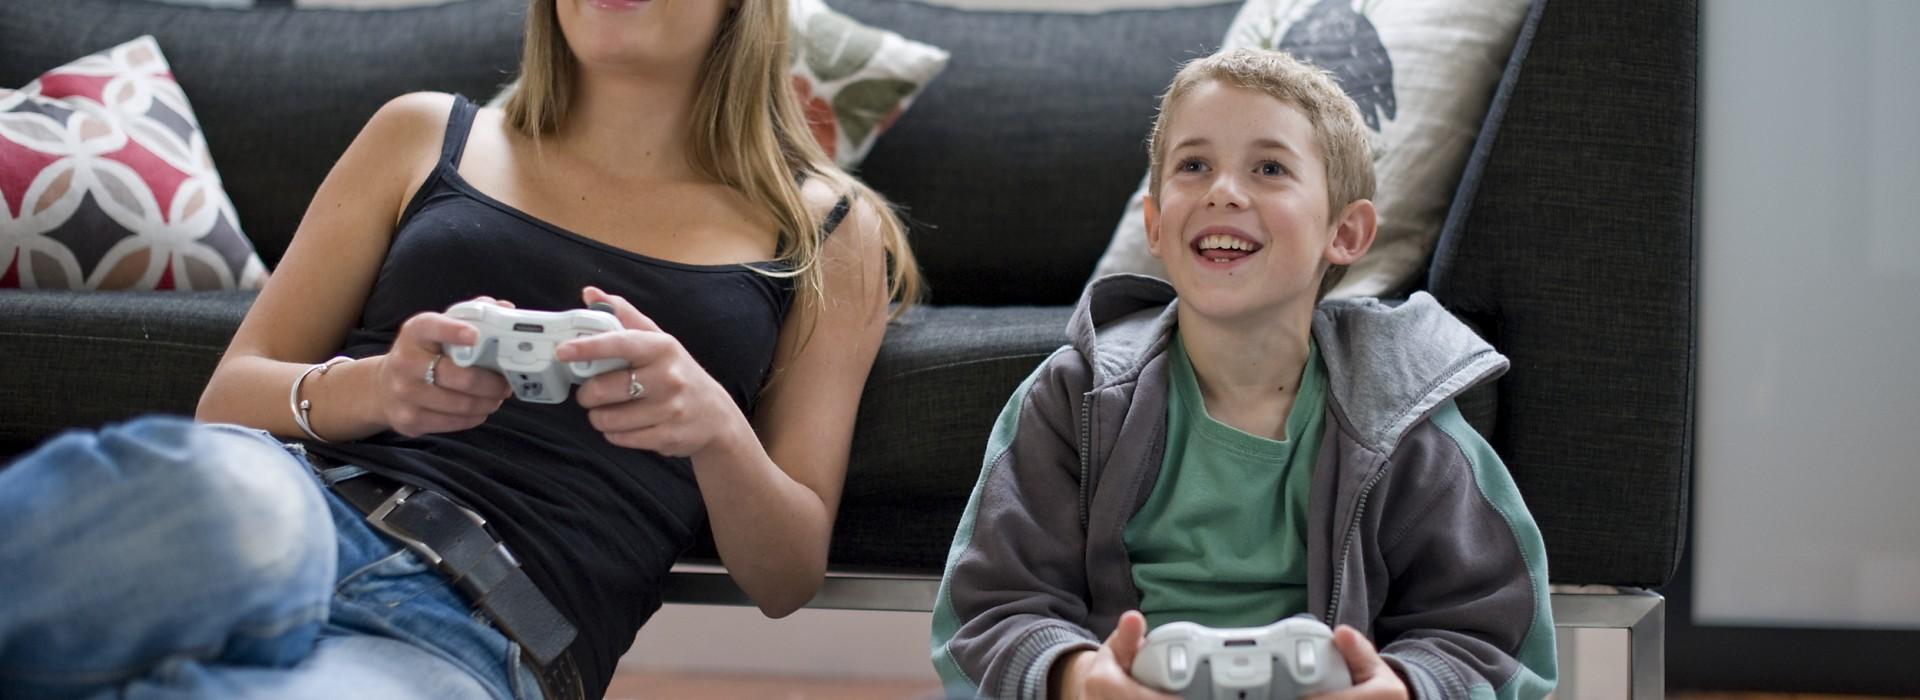 Woman (24 yrs) & boy (9 yrs) playing Xbox in apartment living room